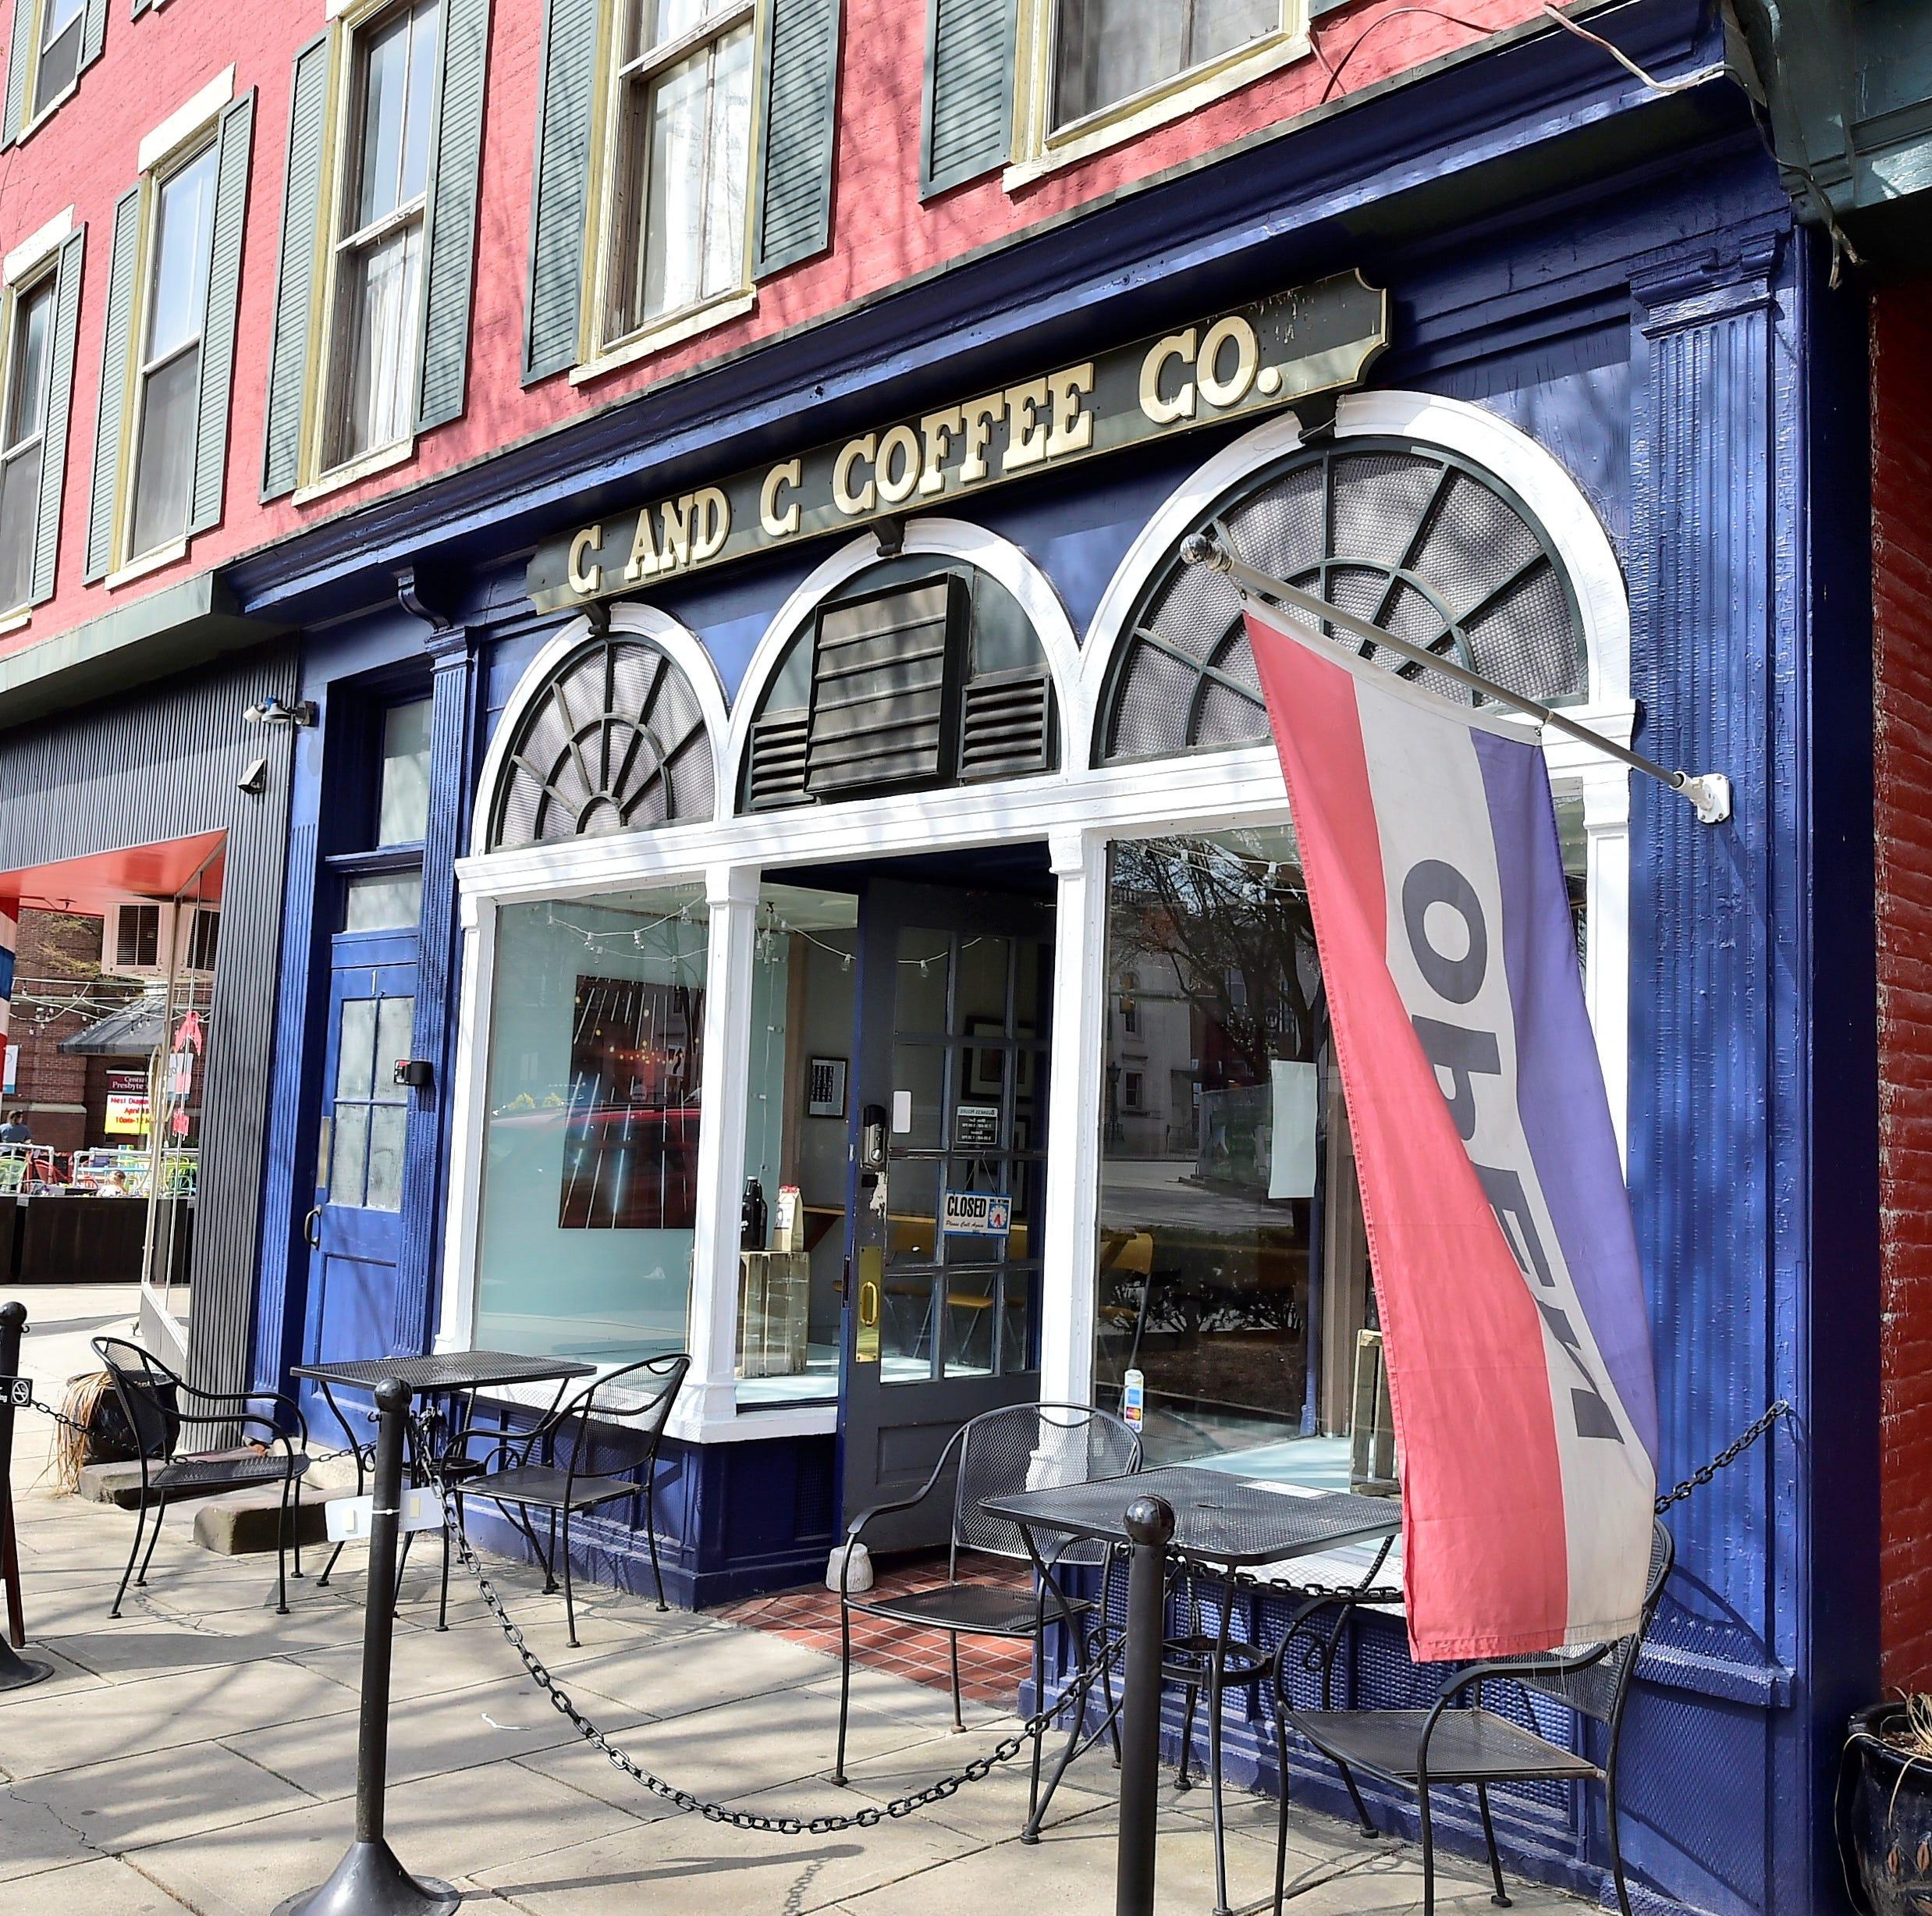 Chambersburg's C&C Coffee to transform into Denim Coffee